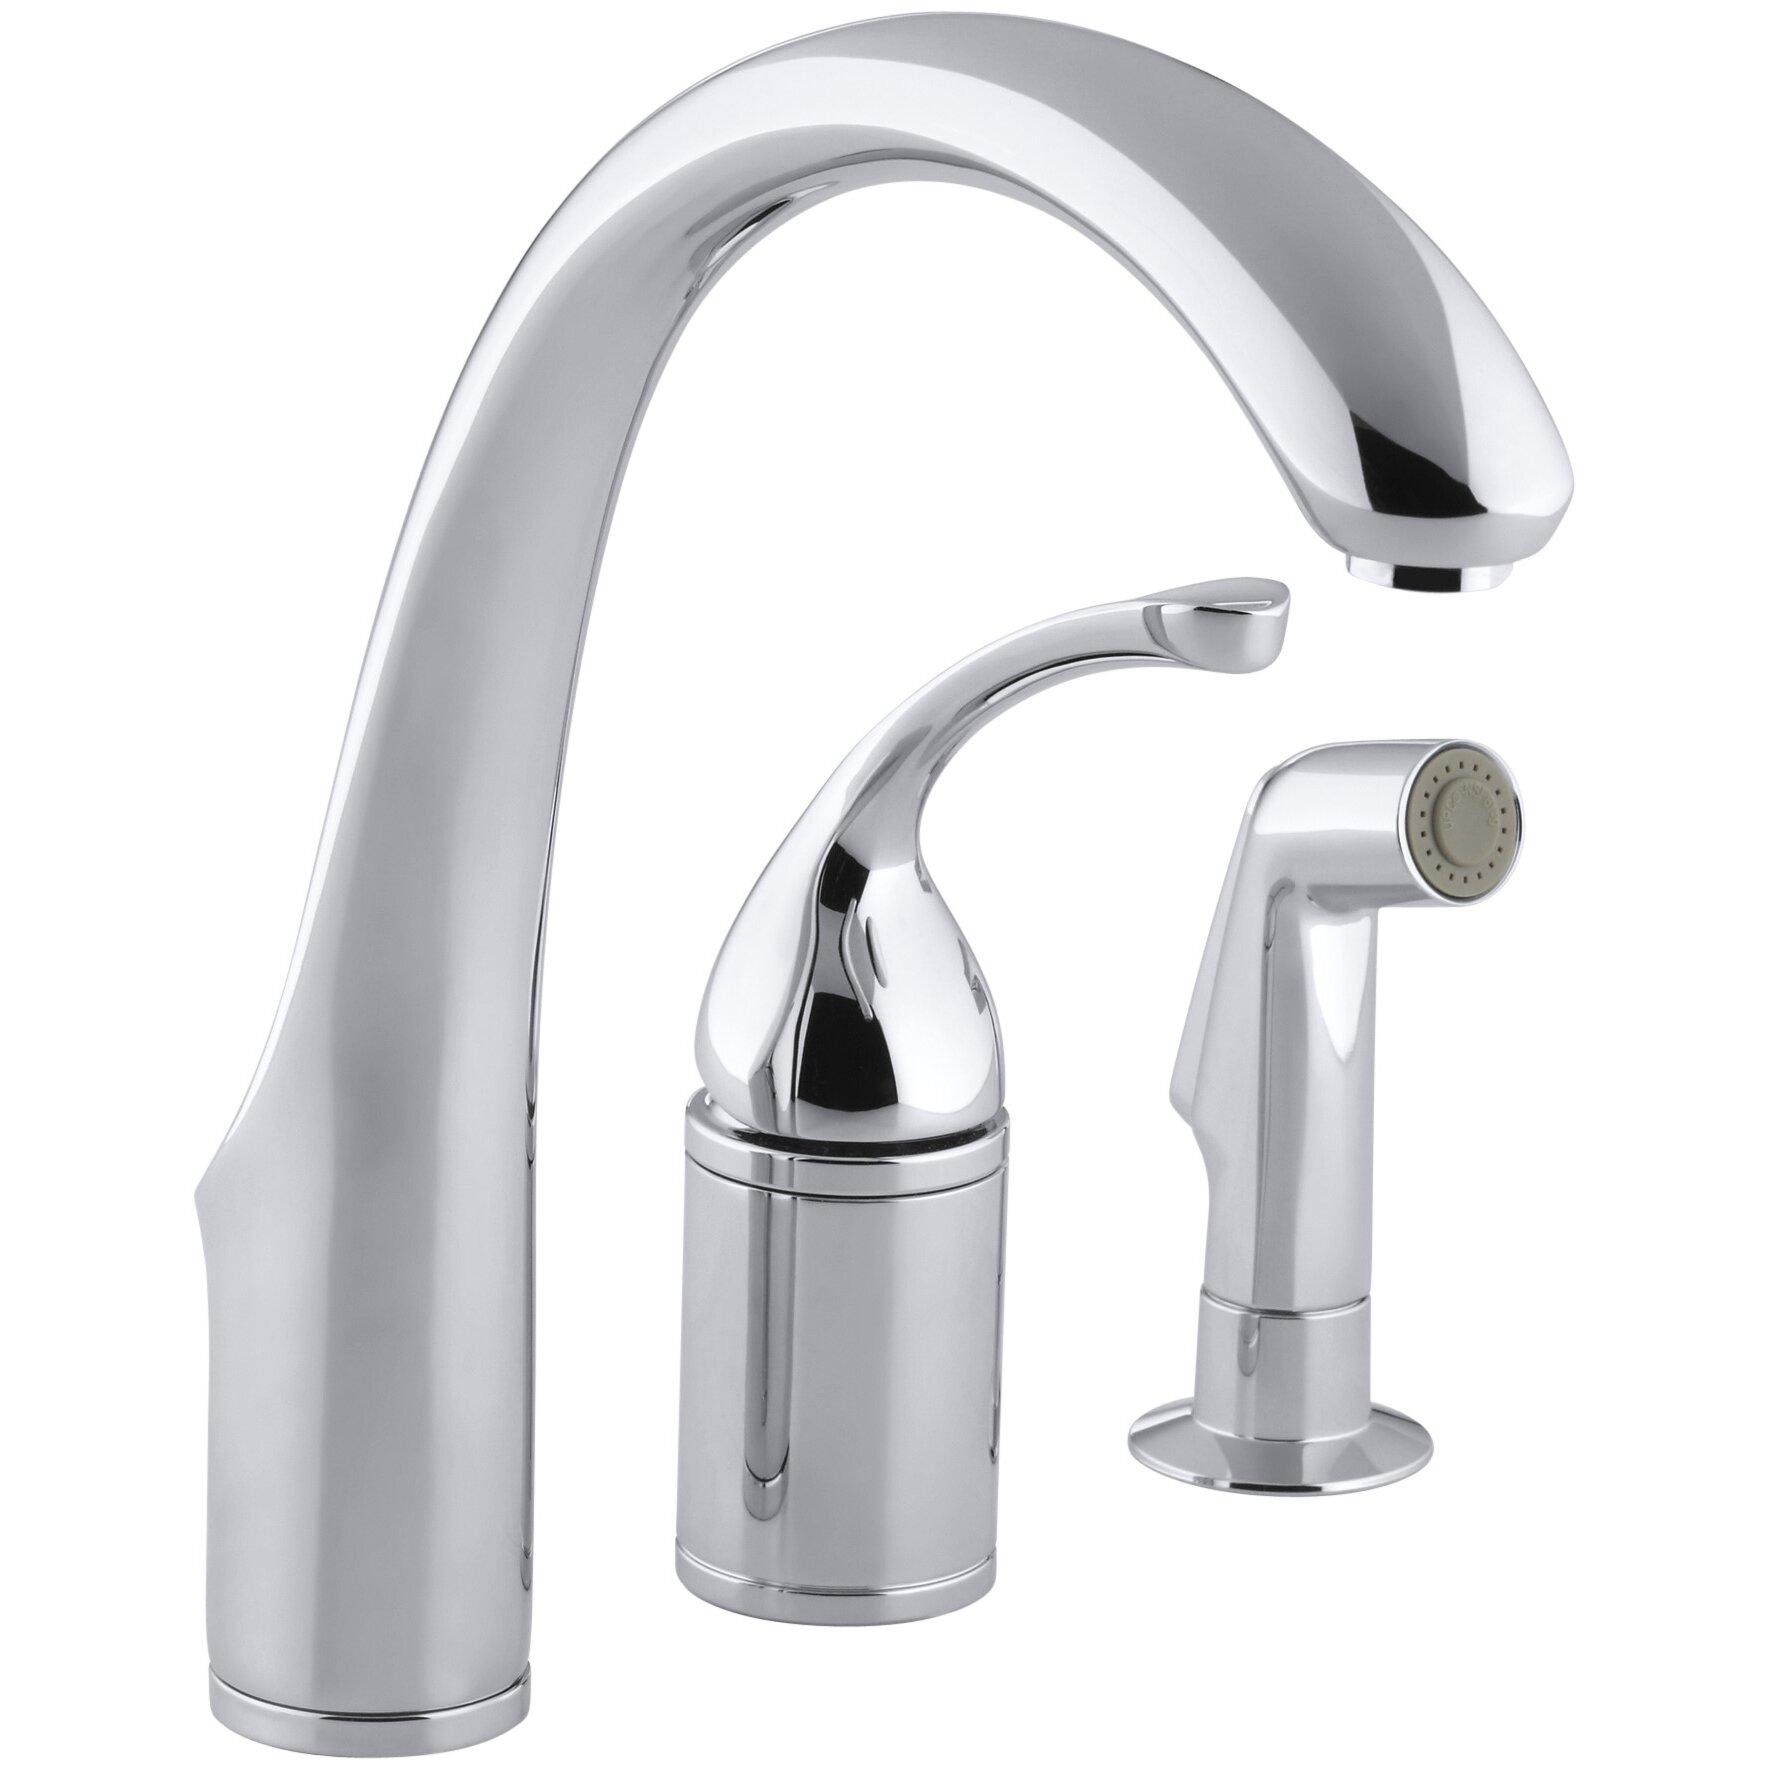 Replace Bathroom Faucet Installing A Bathroom Faucet Bathroom